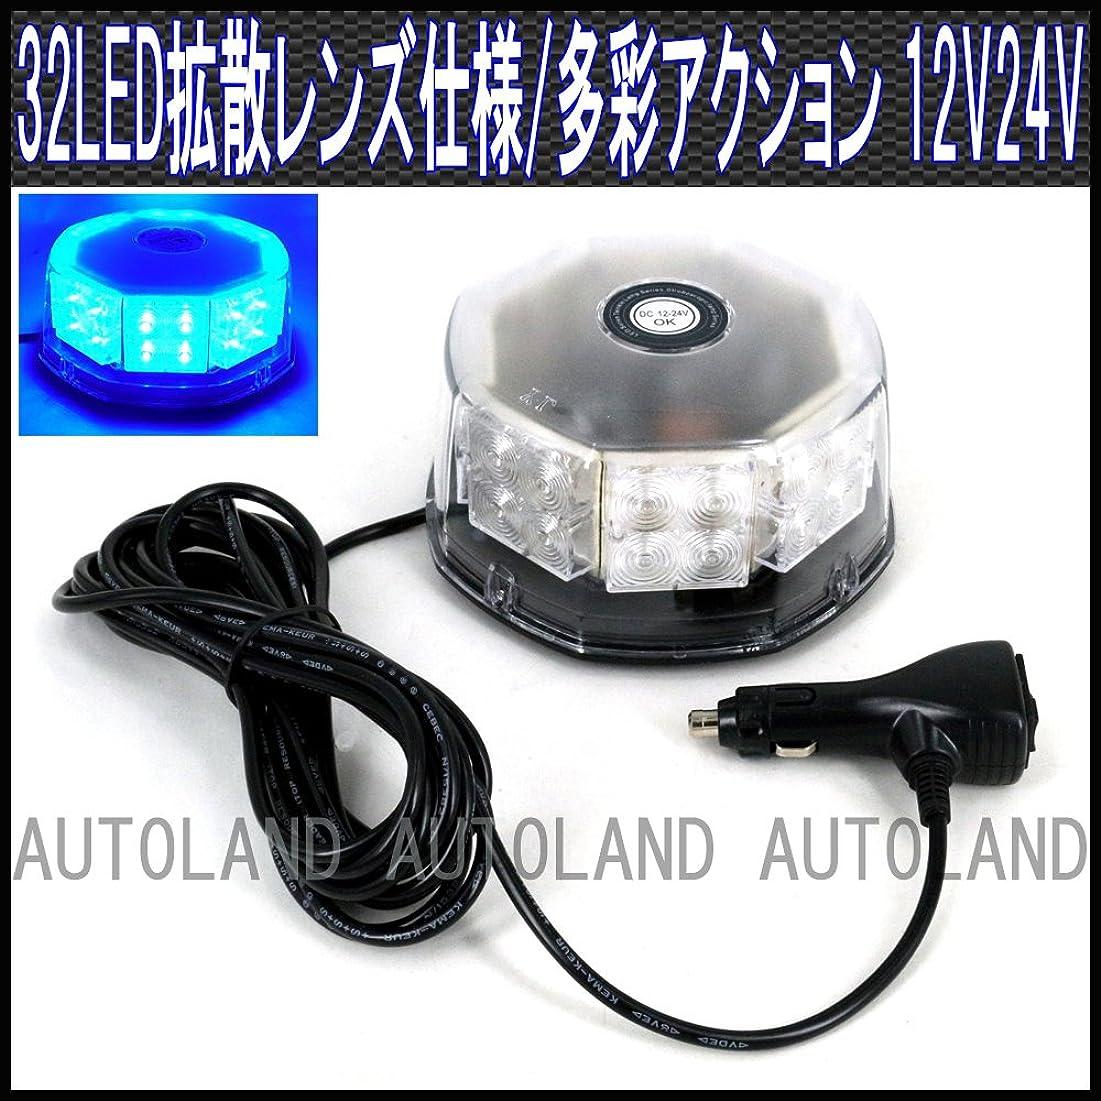 遠近法増幅器痛みDiaoaokiss LED 警告灯 電池式 非常信号灯 led 回転灯 安全ライト 警備 夜間作業 日本語説明書付き (1個)